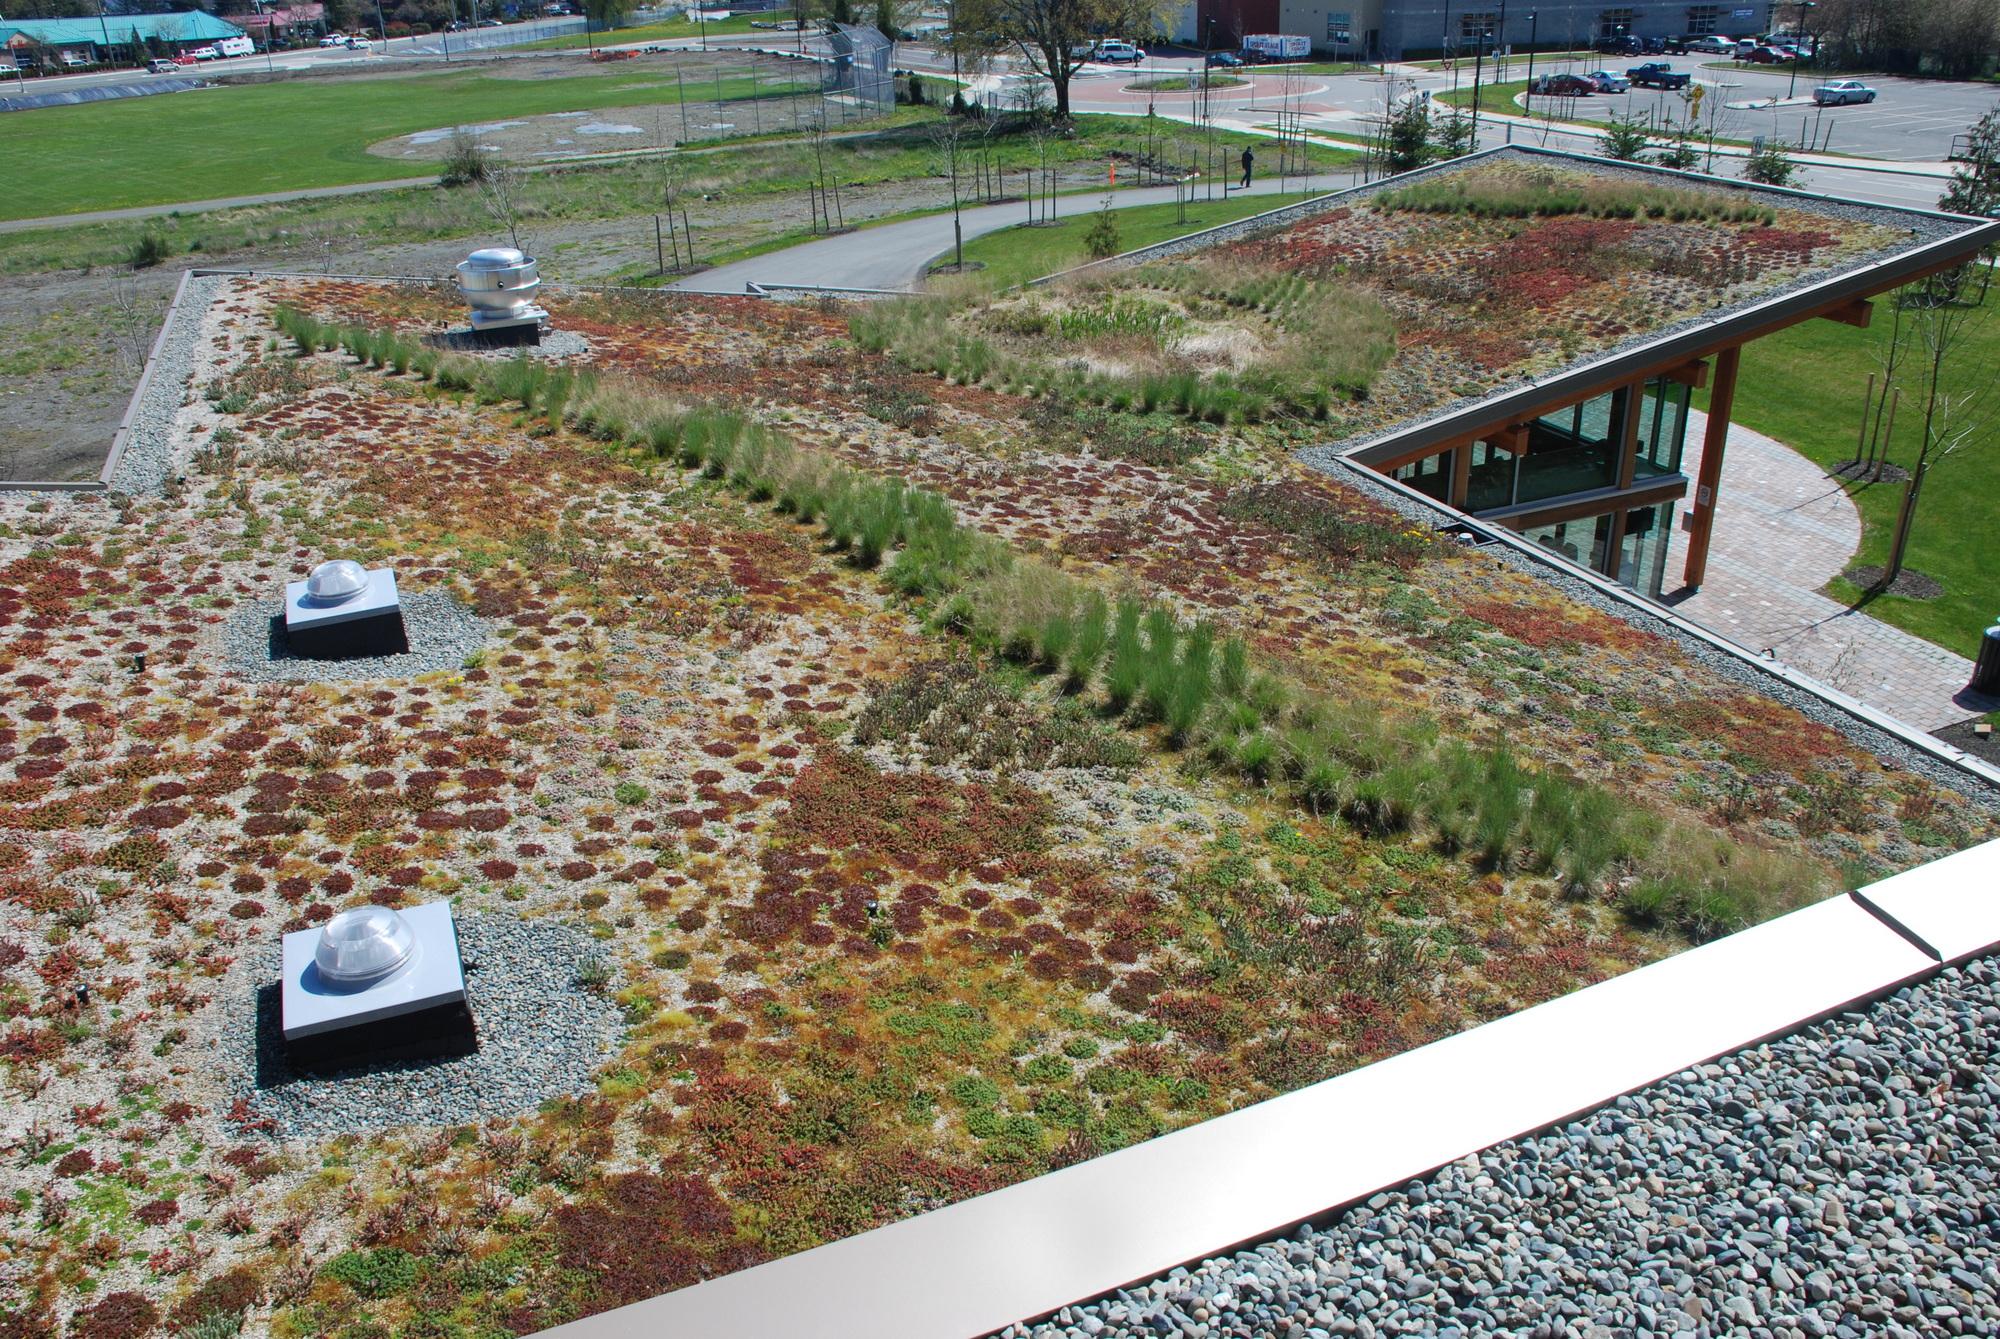 Green Roofs In Nanaimo A Unique Partnership Has Precedent